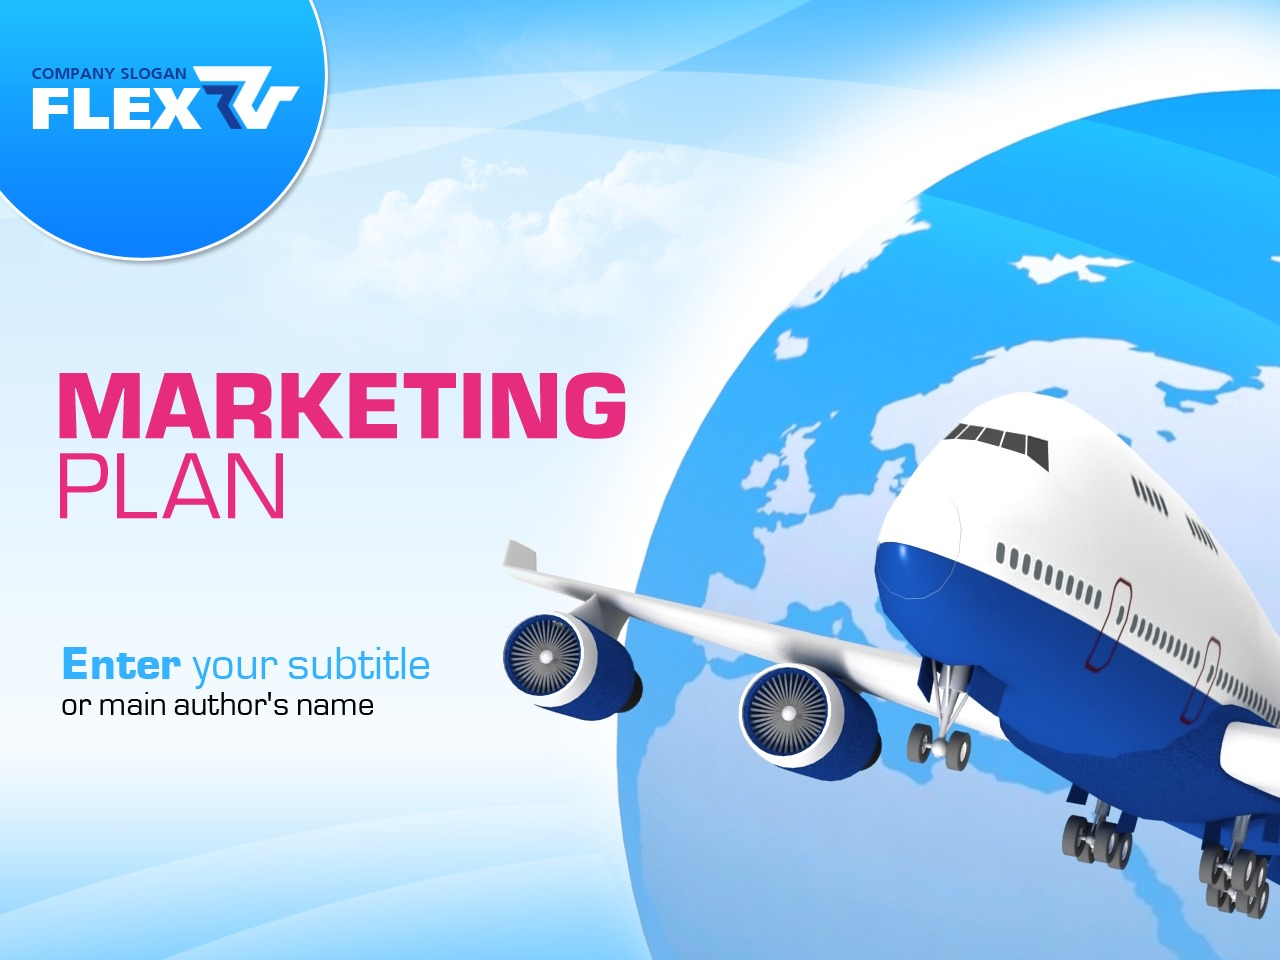 Marketing Agency PowerPoint Template - screenshot